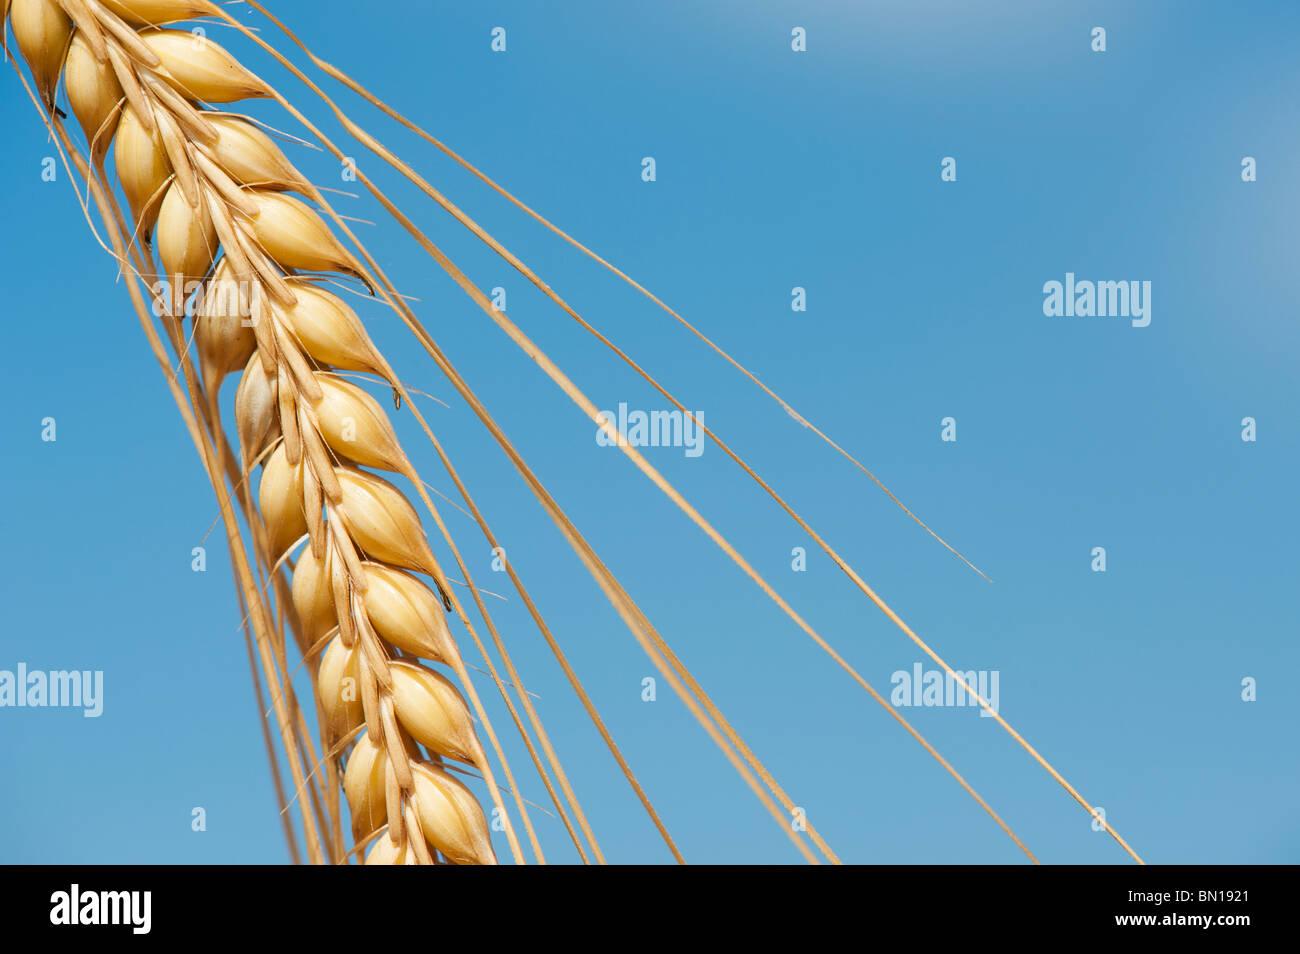 Hordeum vulgare. Single barley stem ripening against a blue sky - Stock Image